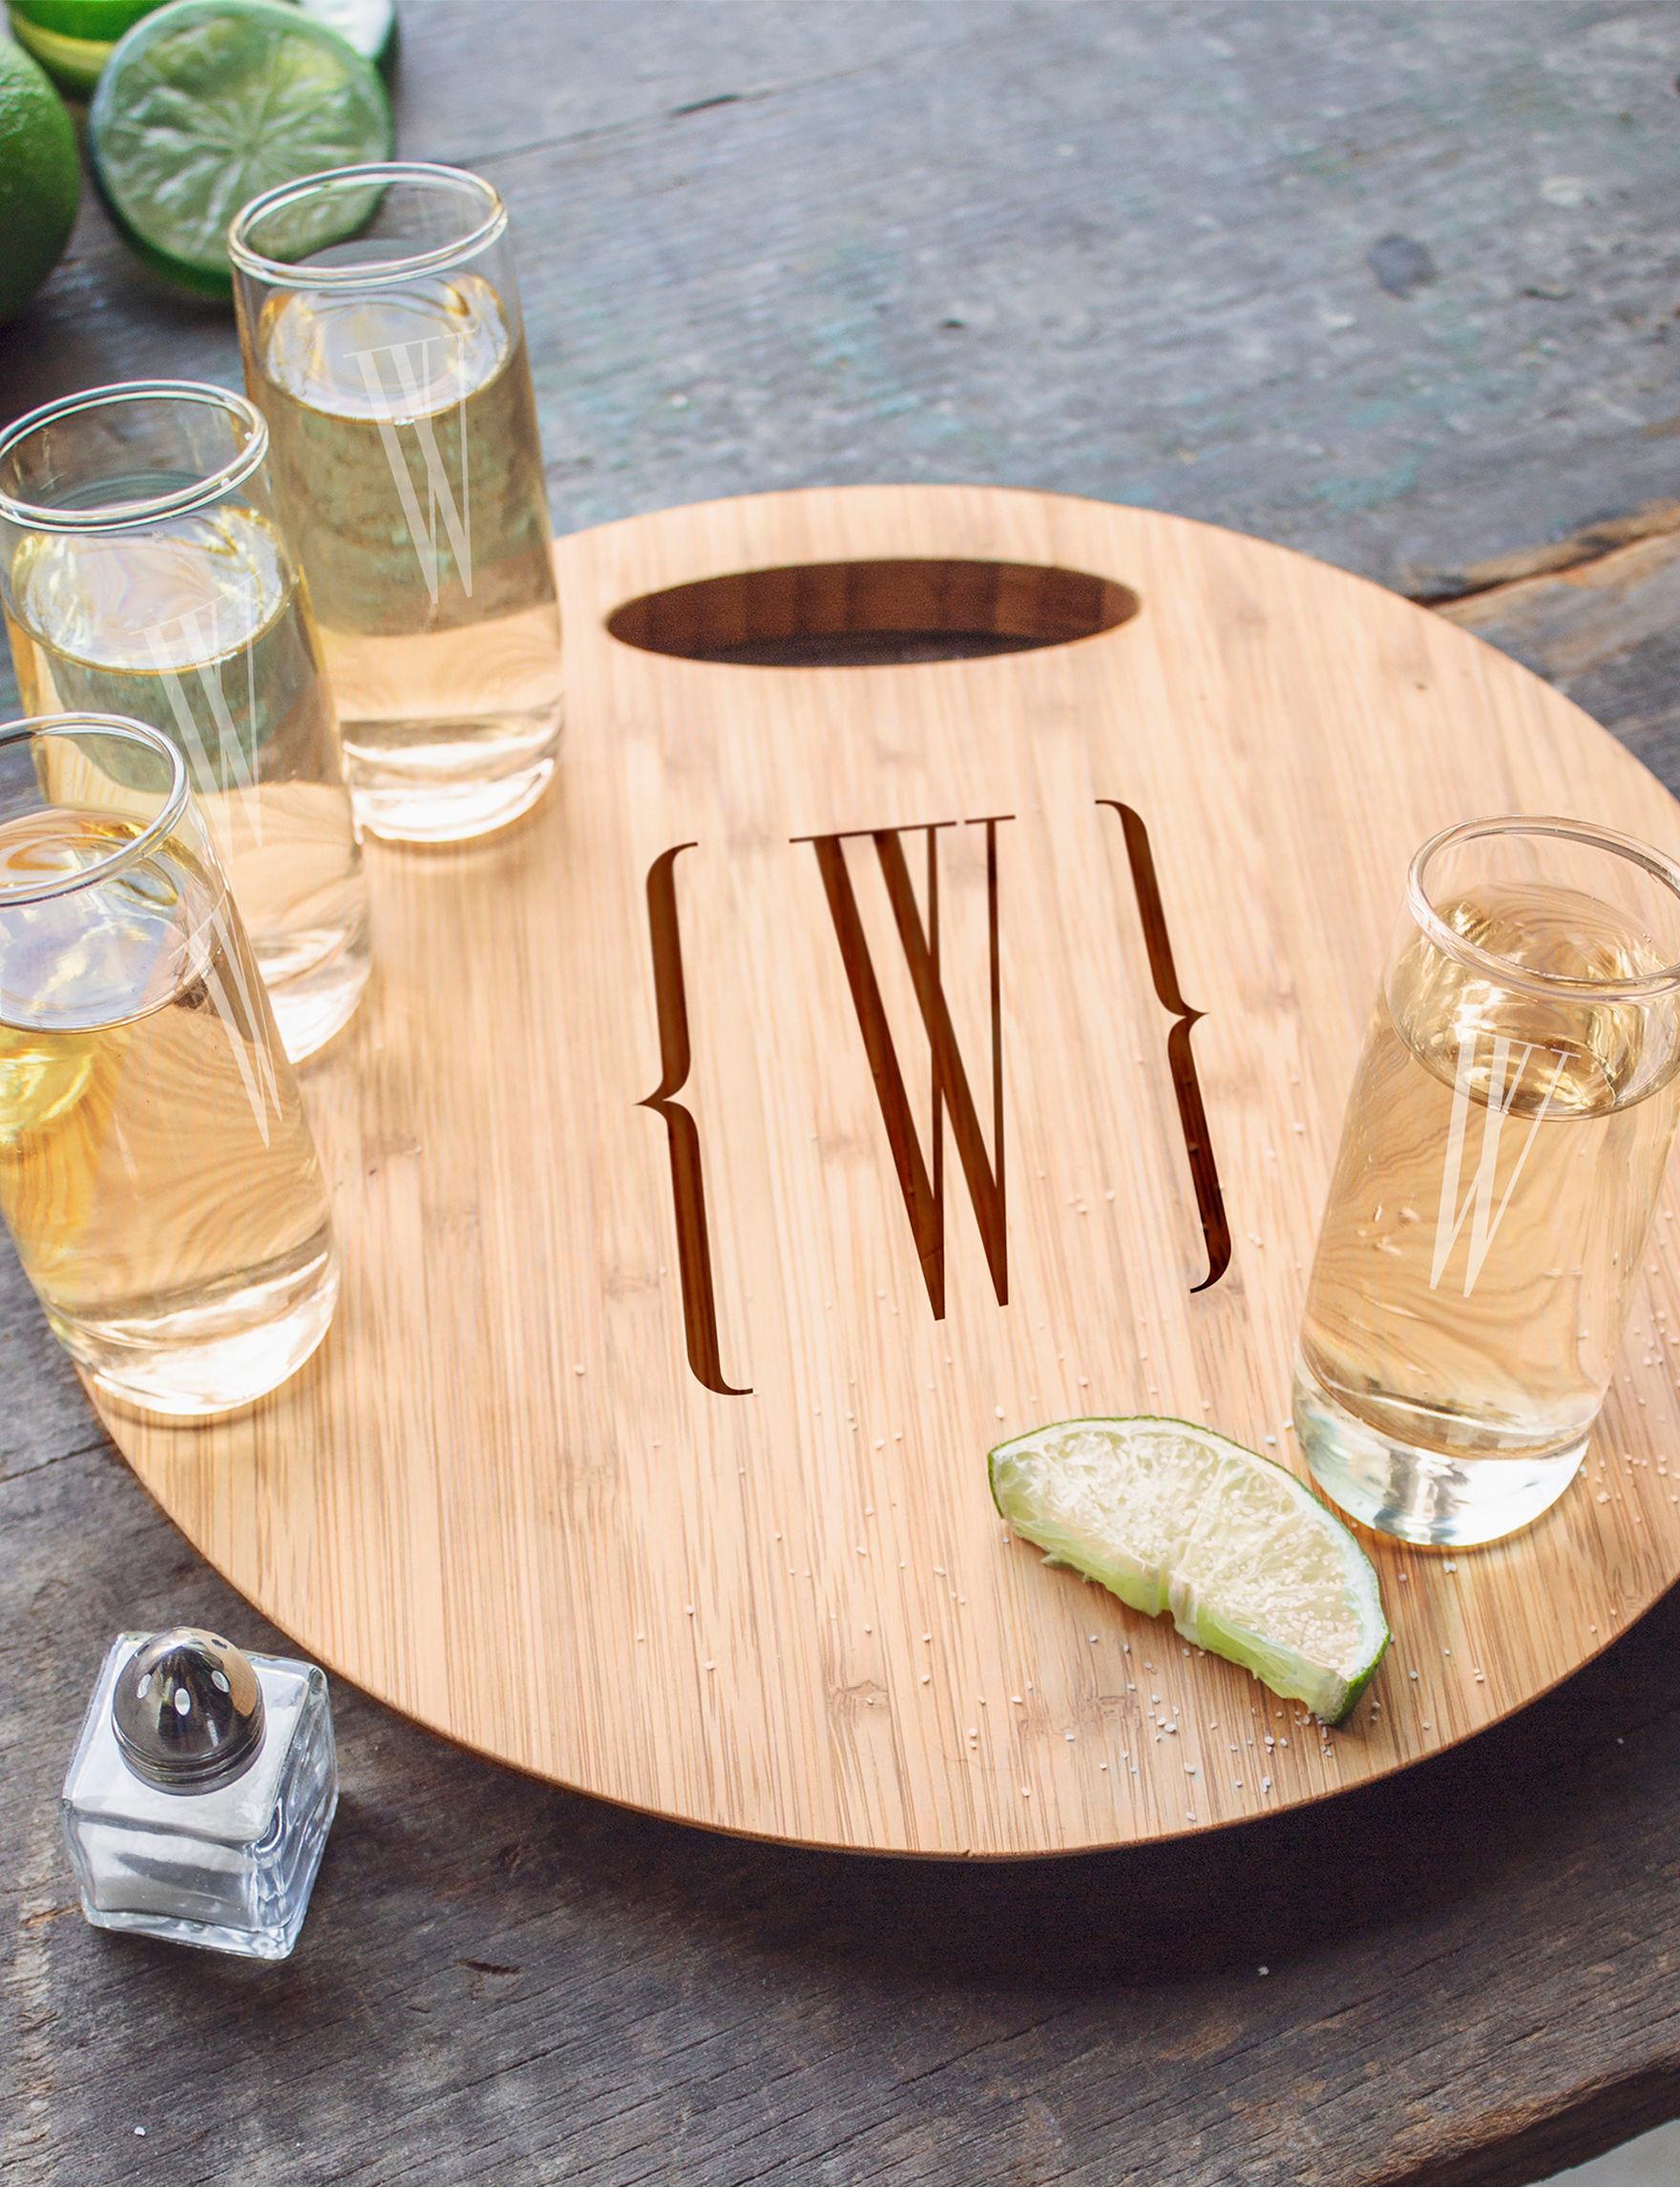 Cathy's Concepts Brown Cocktail & Liquor Glasses Monogram Drinkware